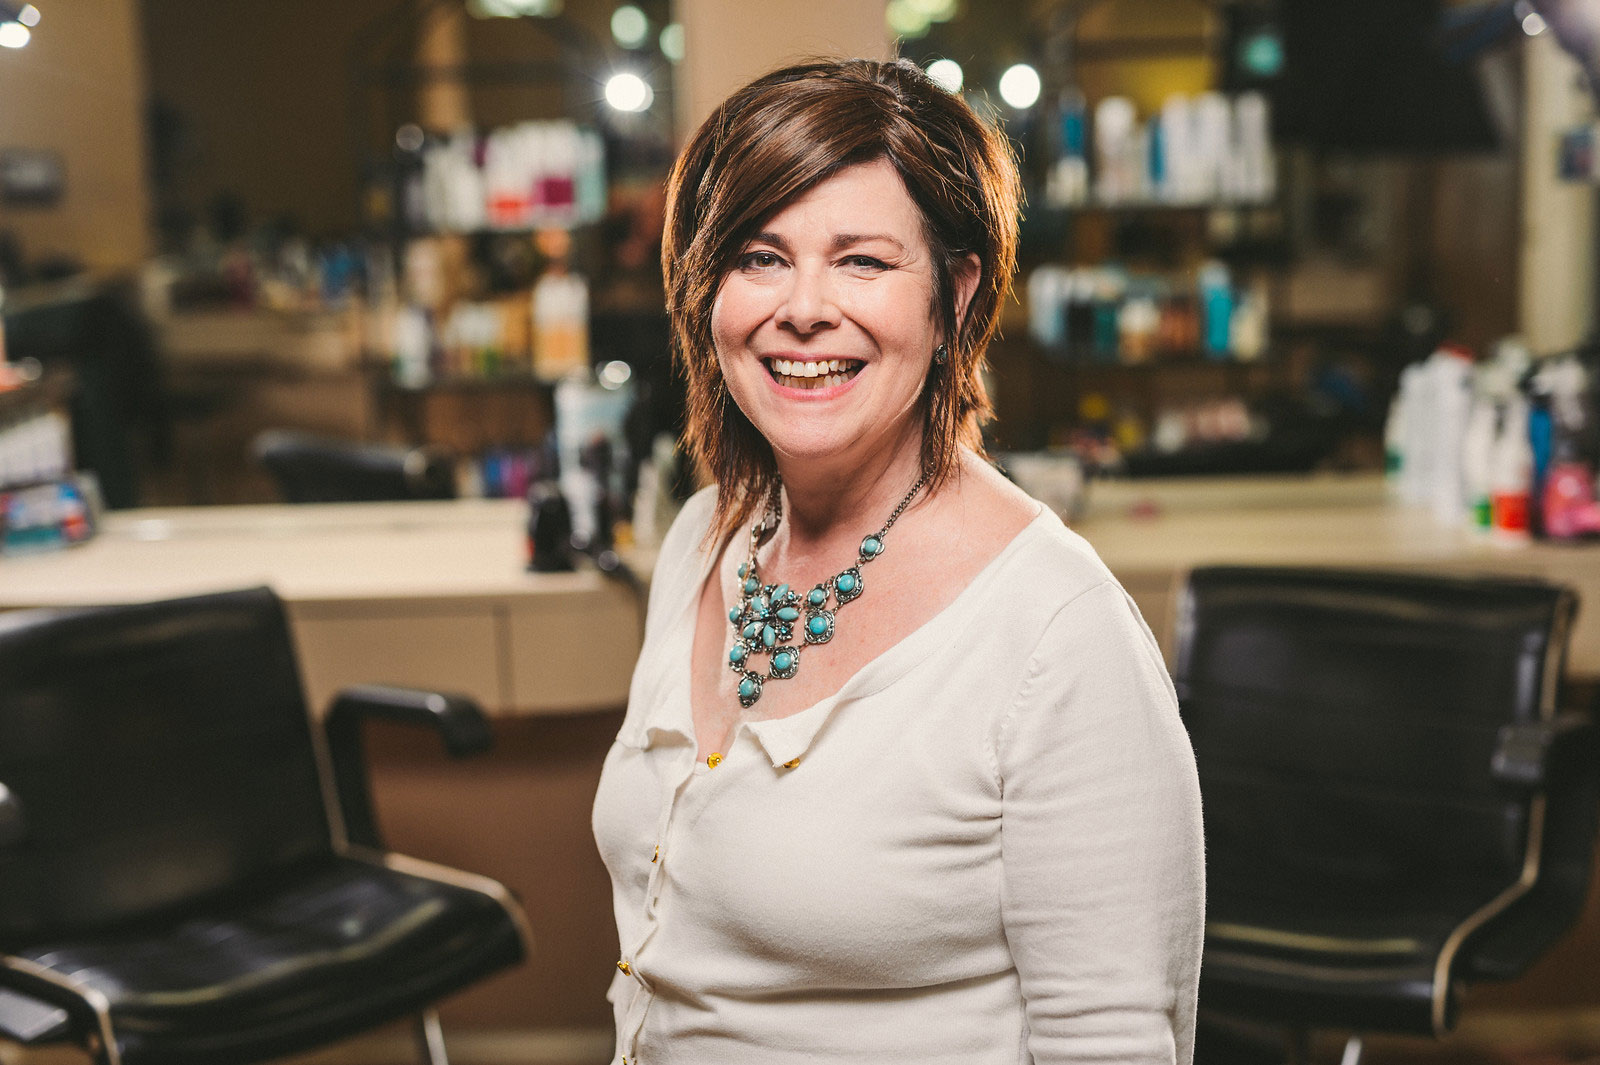 REV Hair Studio - Carol St. Leger